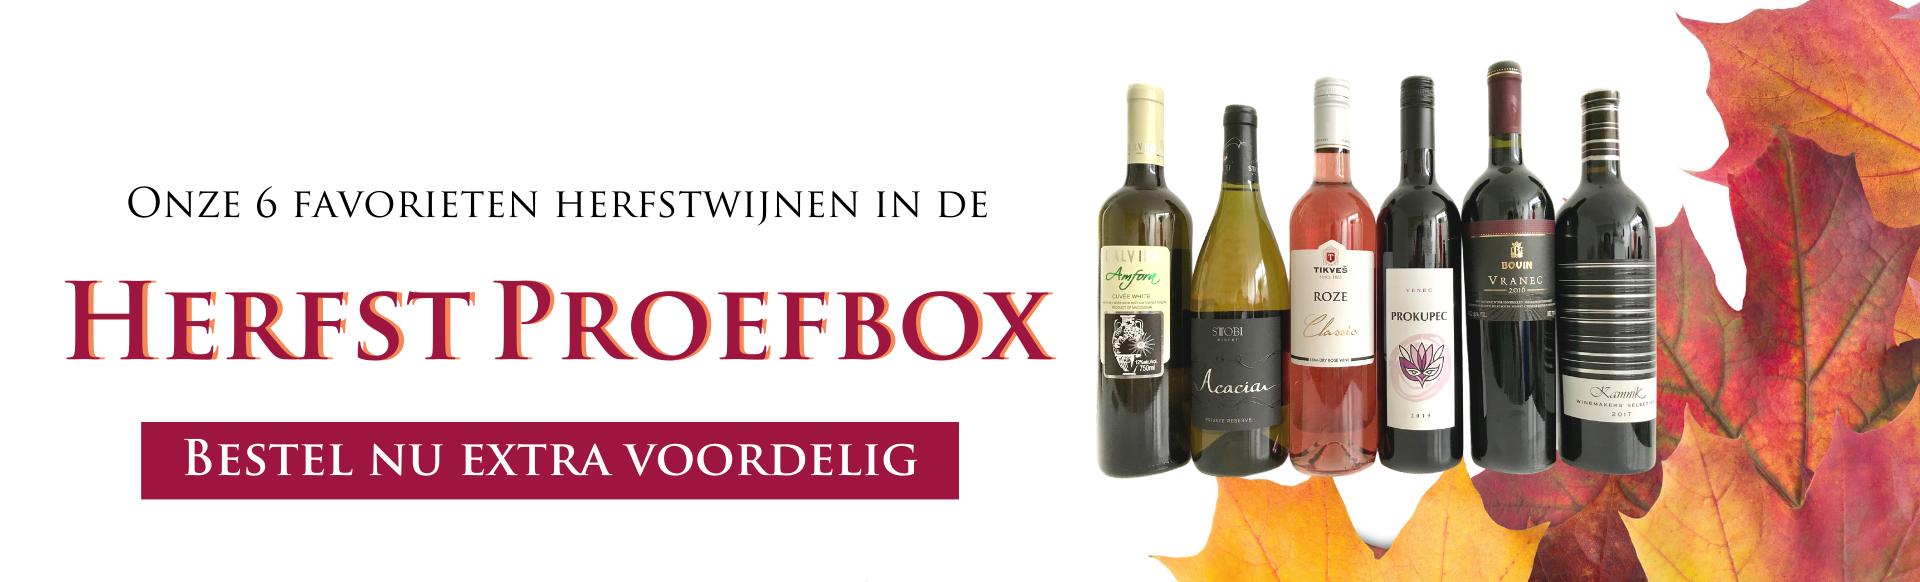 Herfst Proefbox